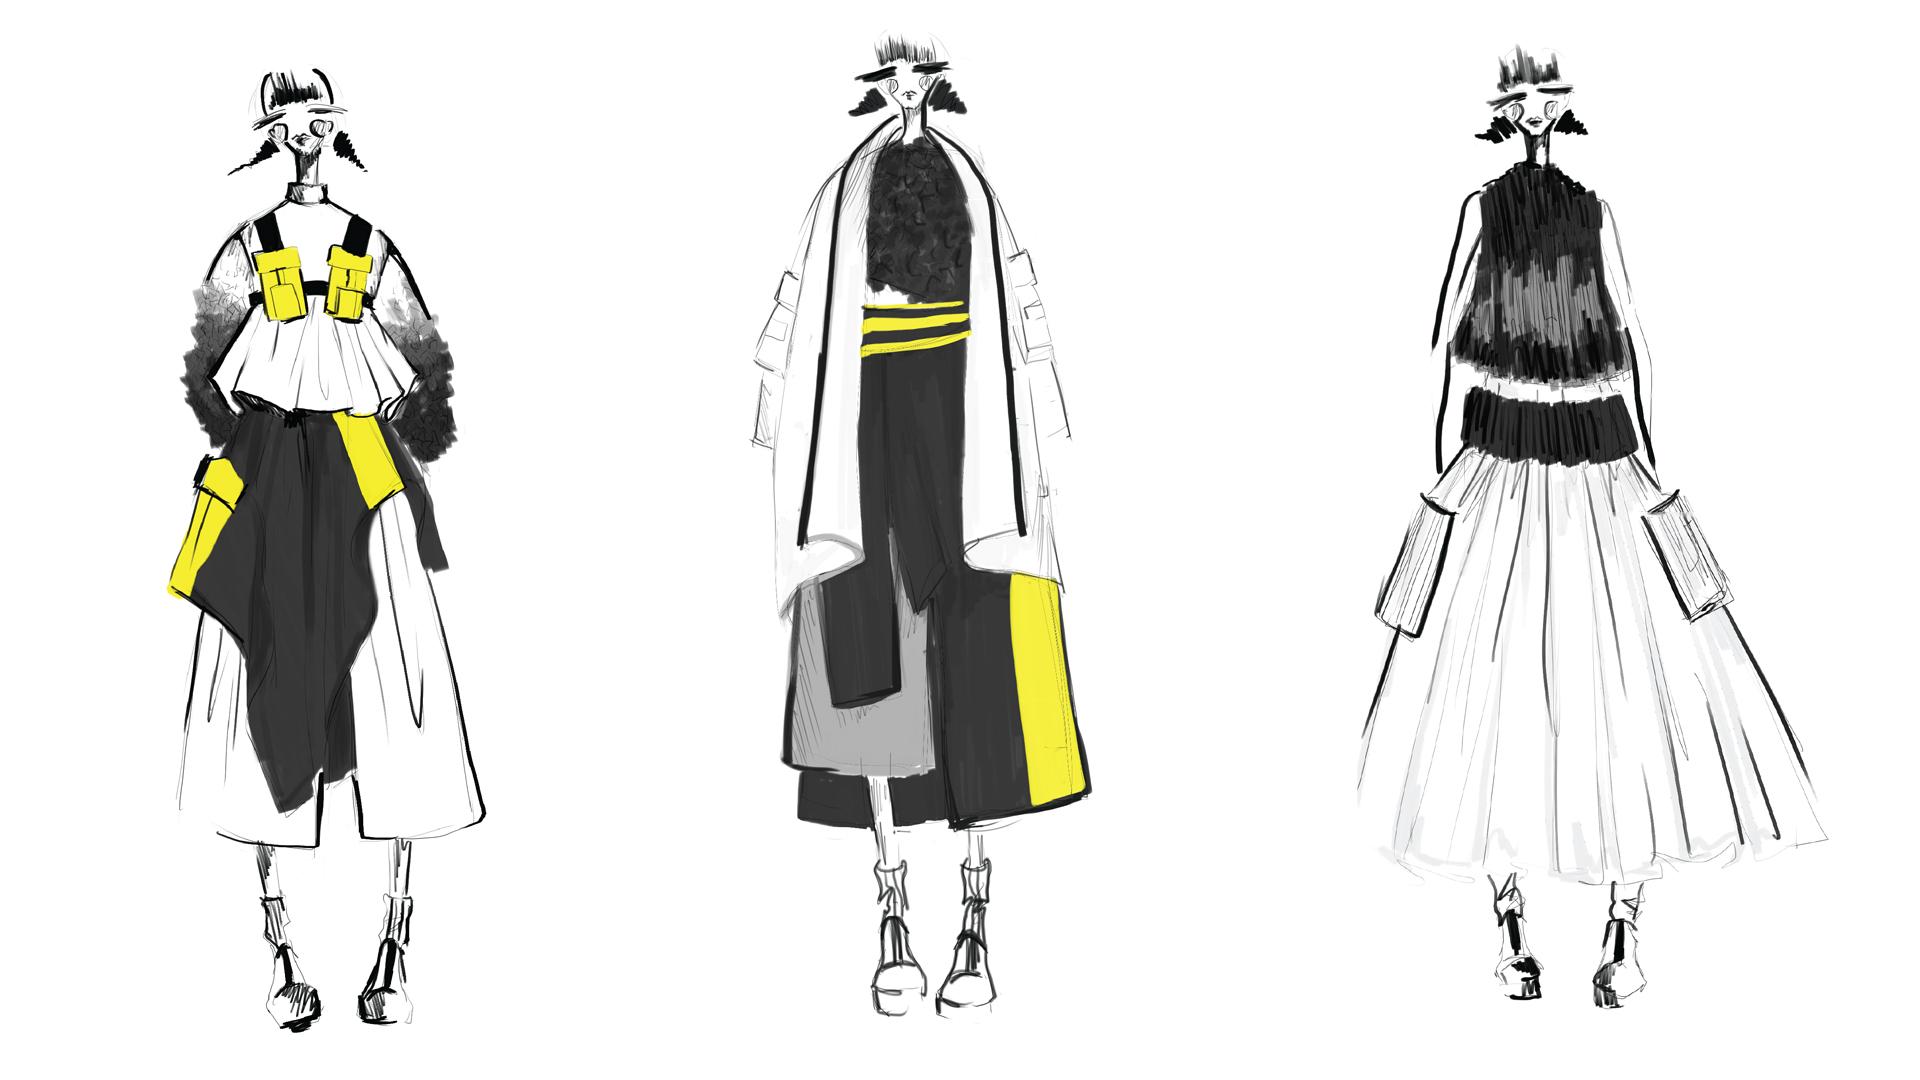 Redress Design Award 2015/16 collection sketches